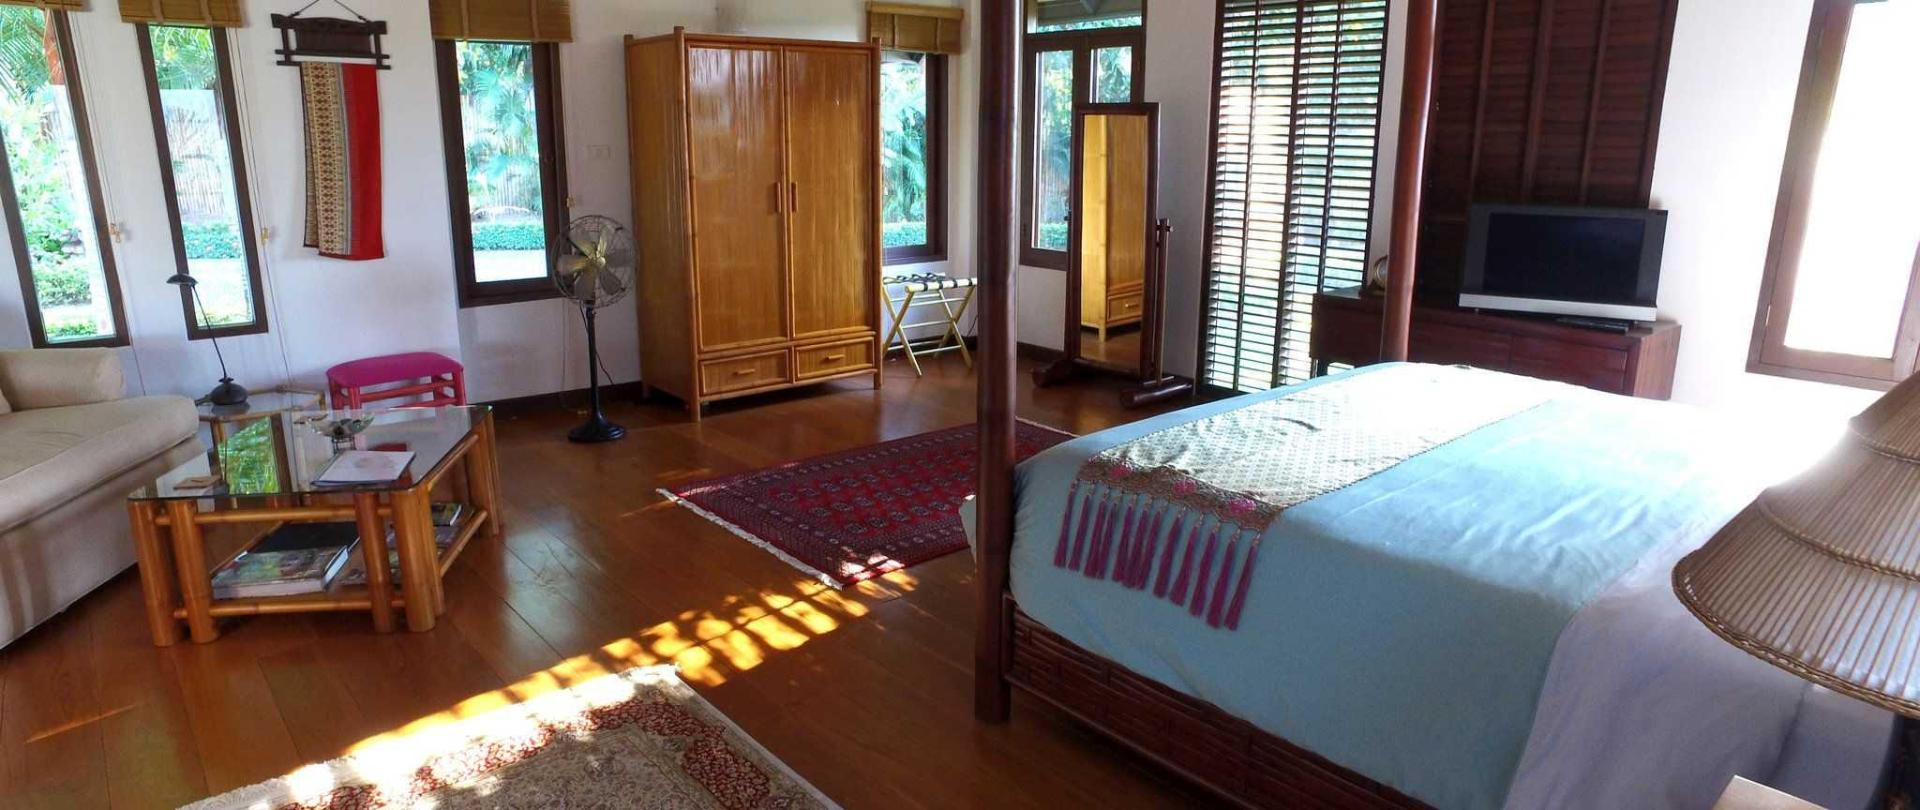 bamboo-bedroom-drone.JPG